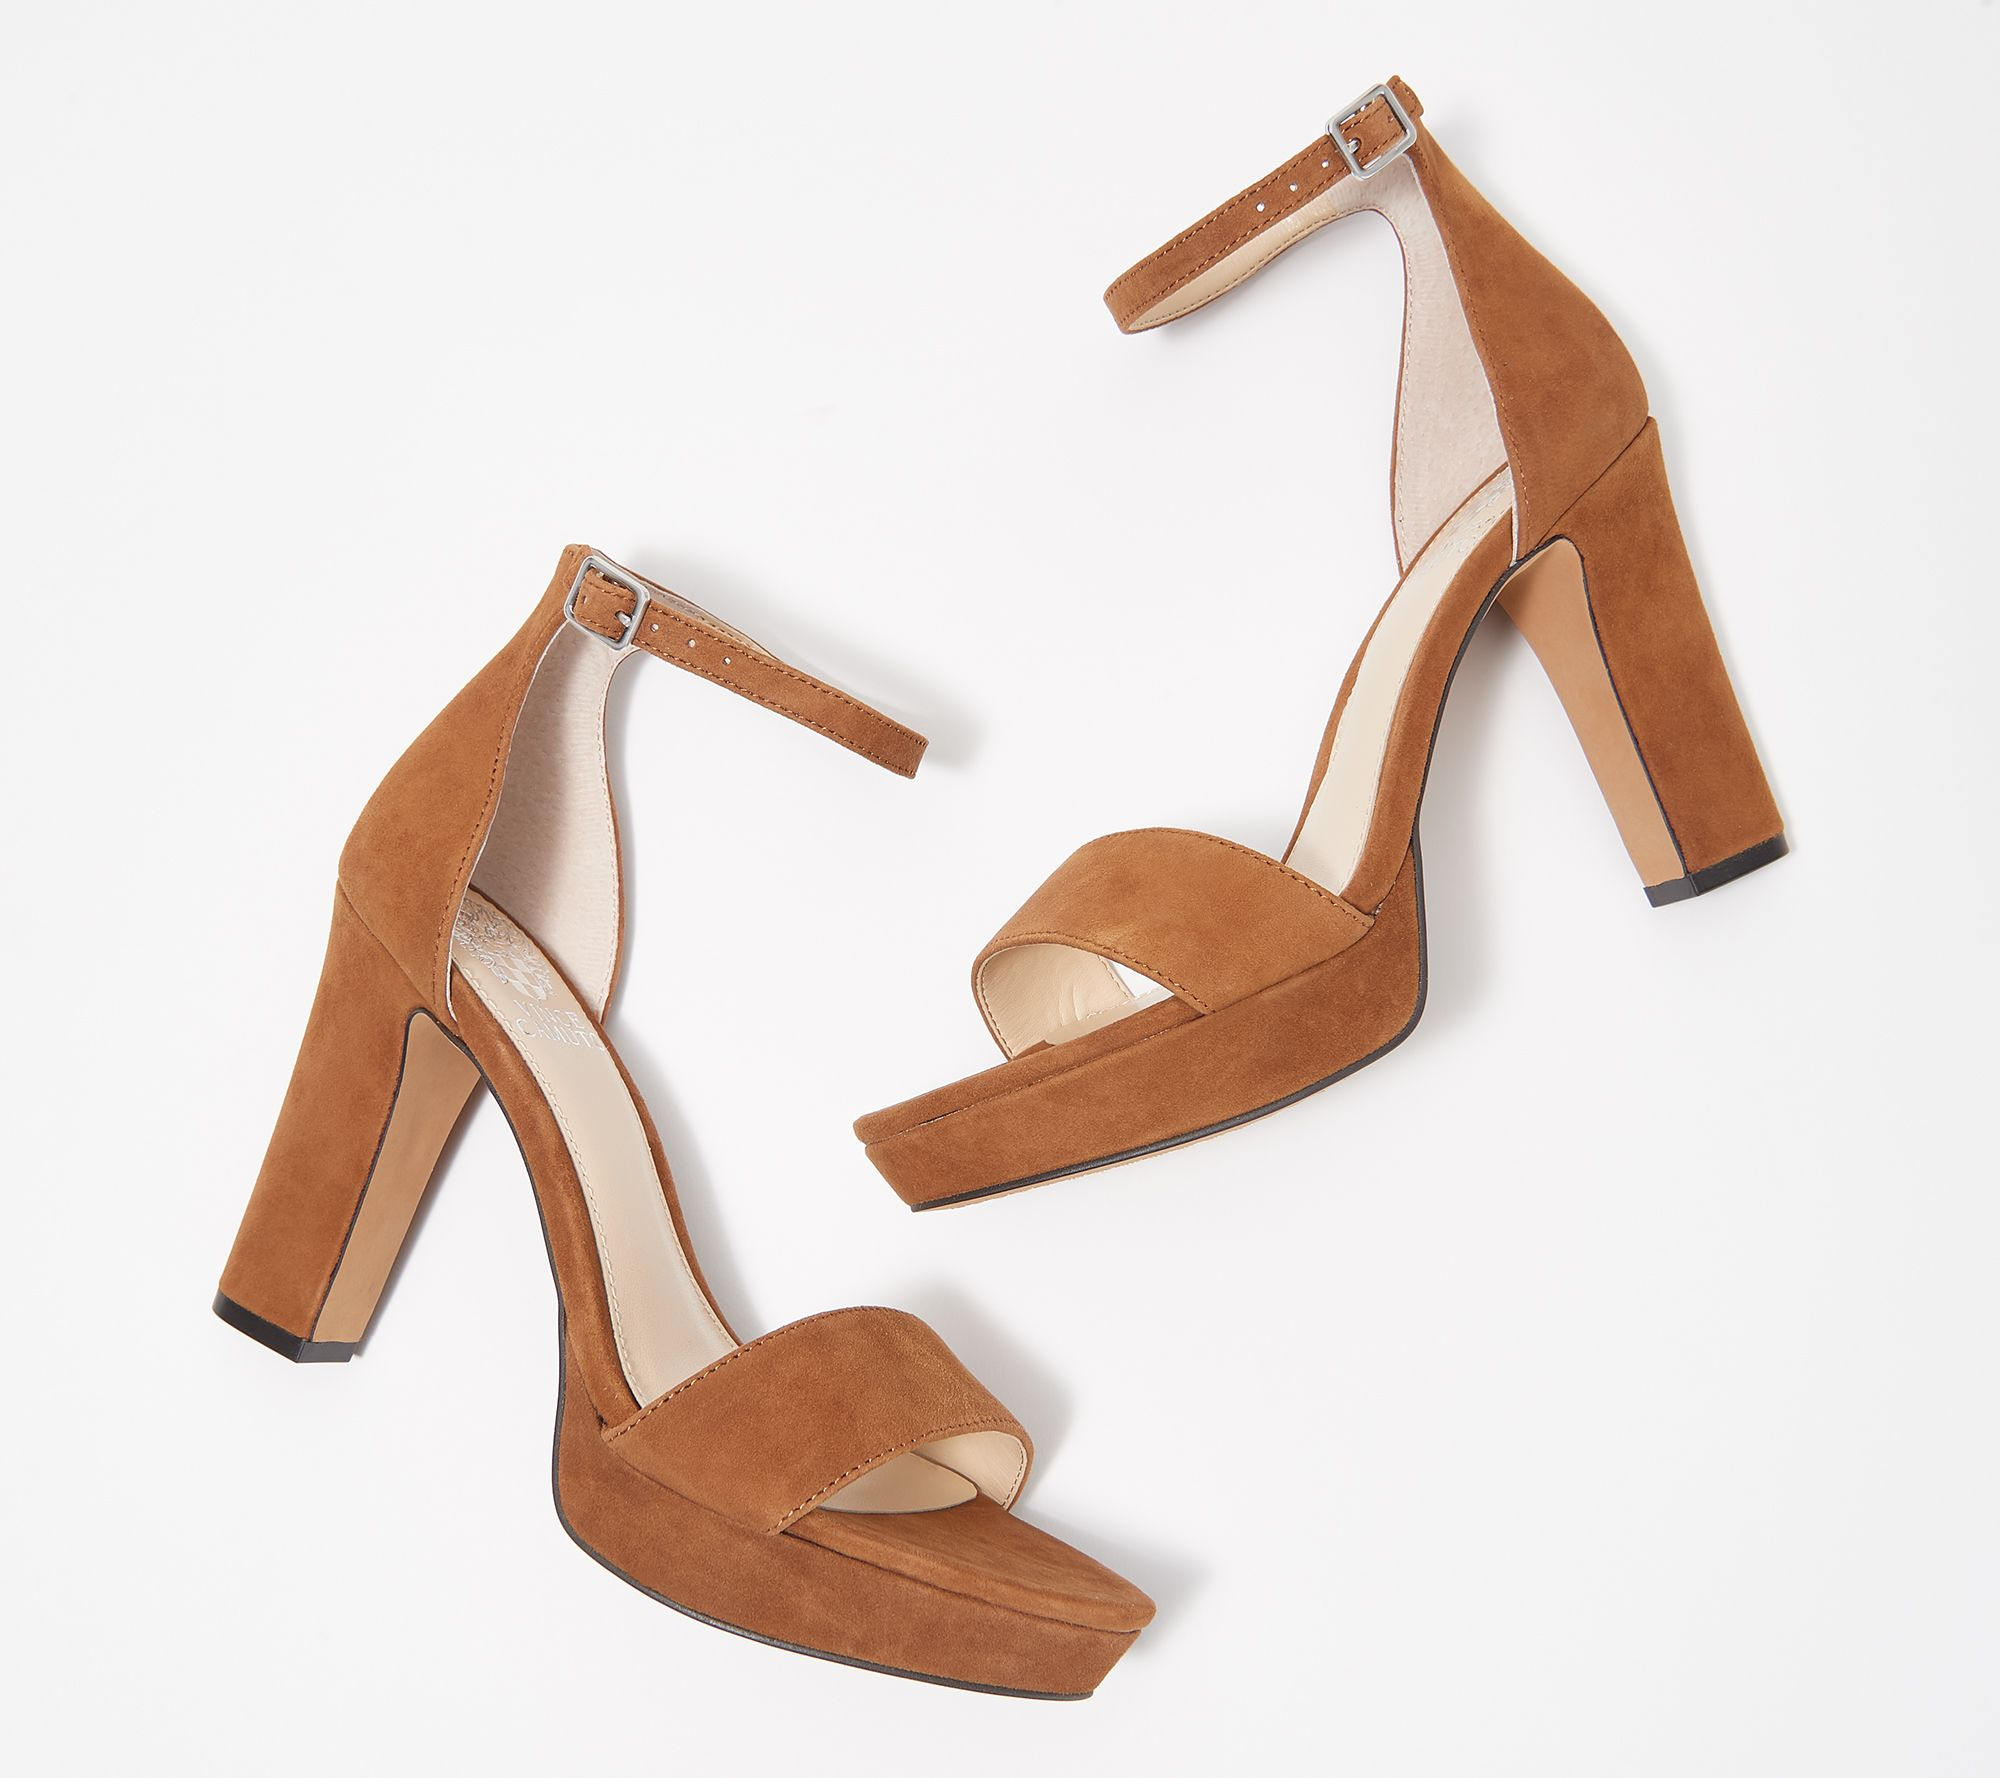 12e311303a7a Vince Camuto Suede Two-Piece Platform Heeled Sandals - Sathina — QVC.com